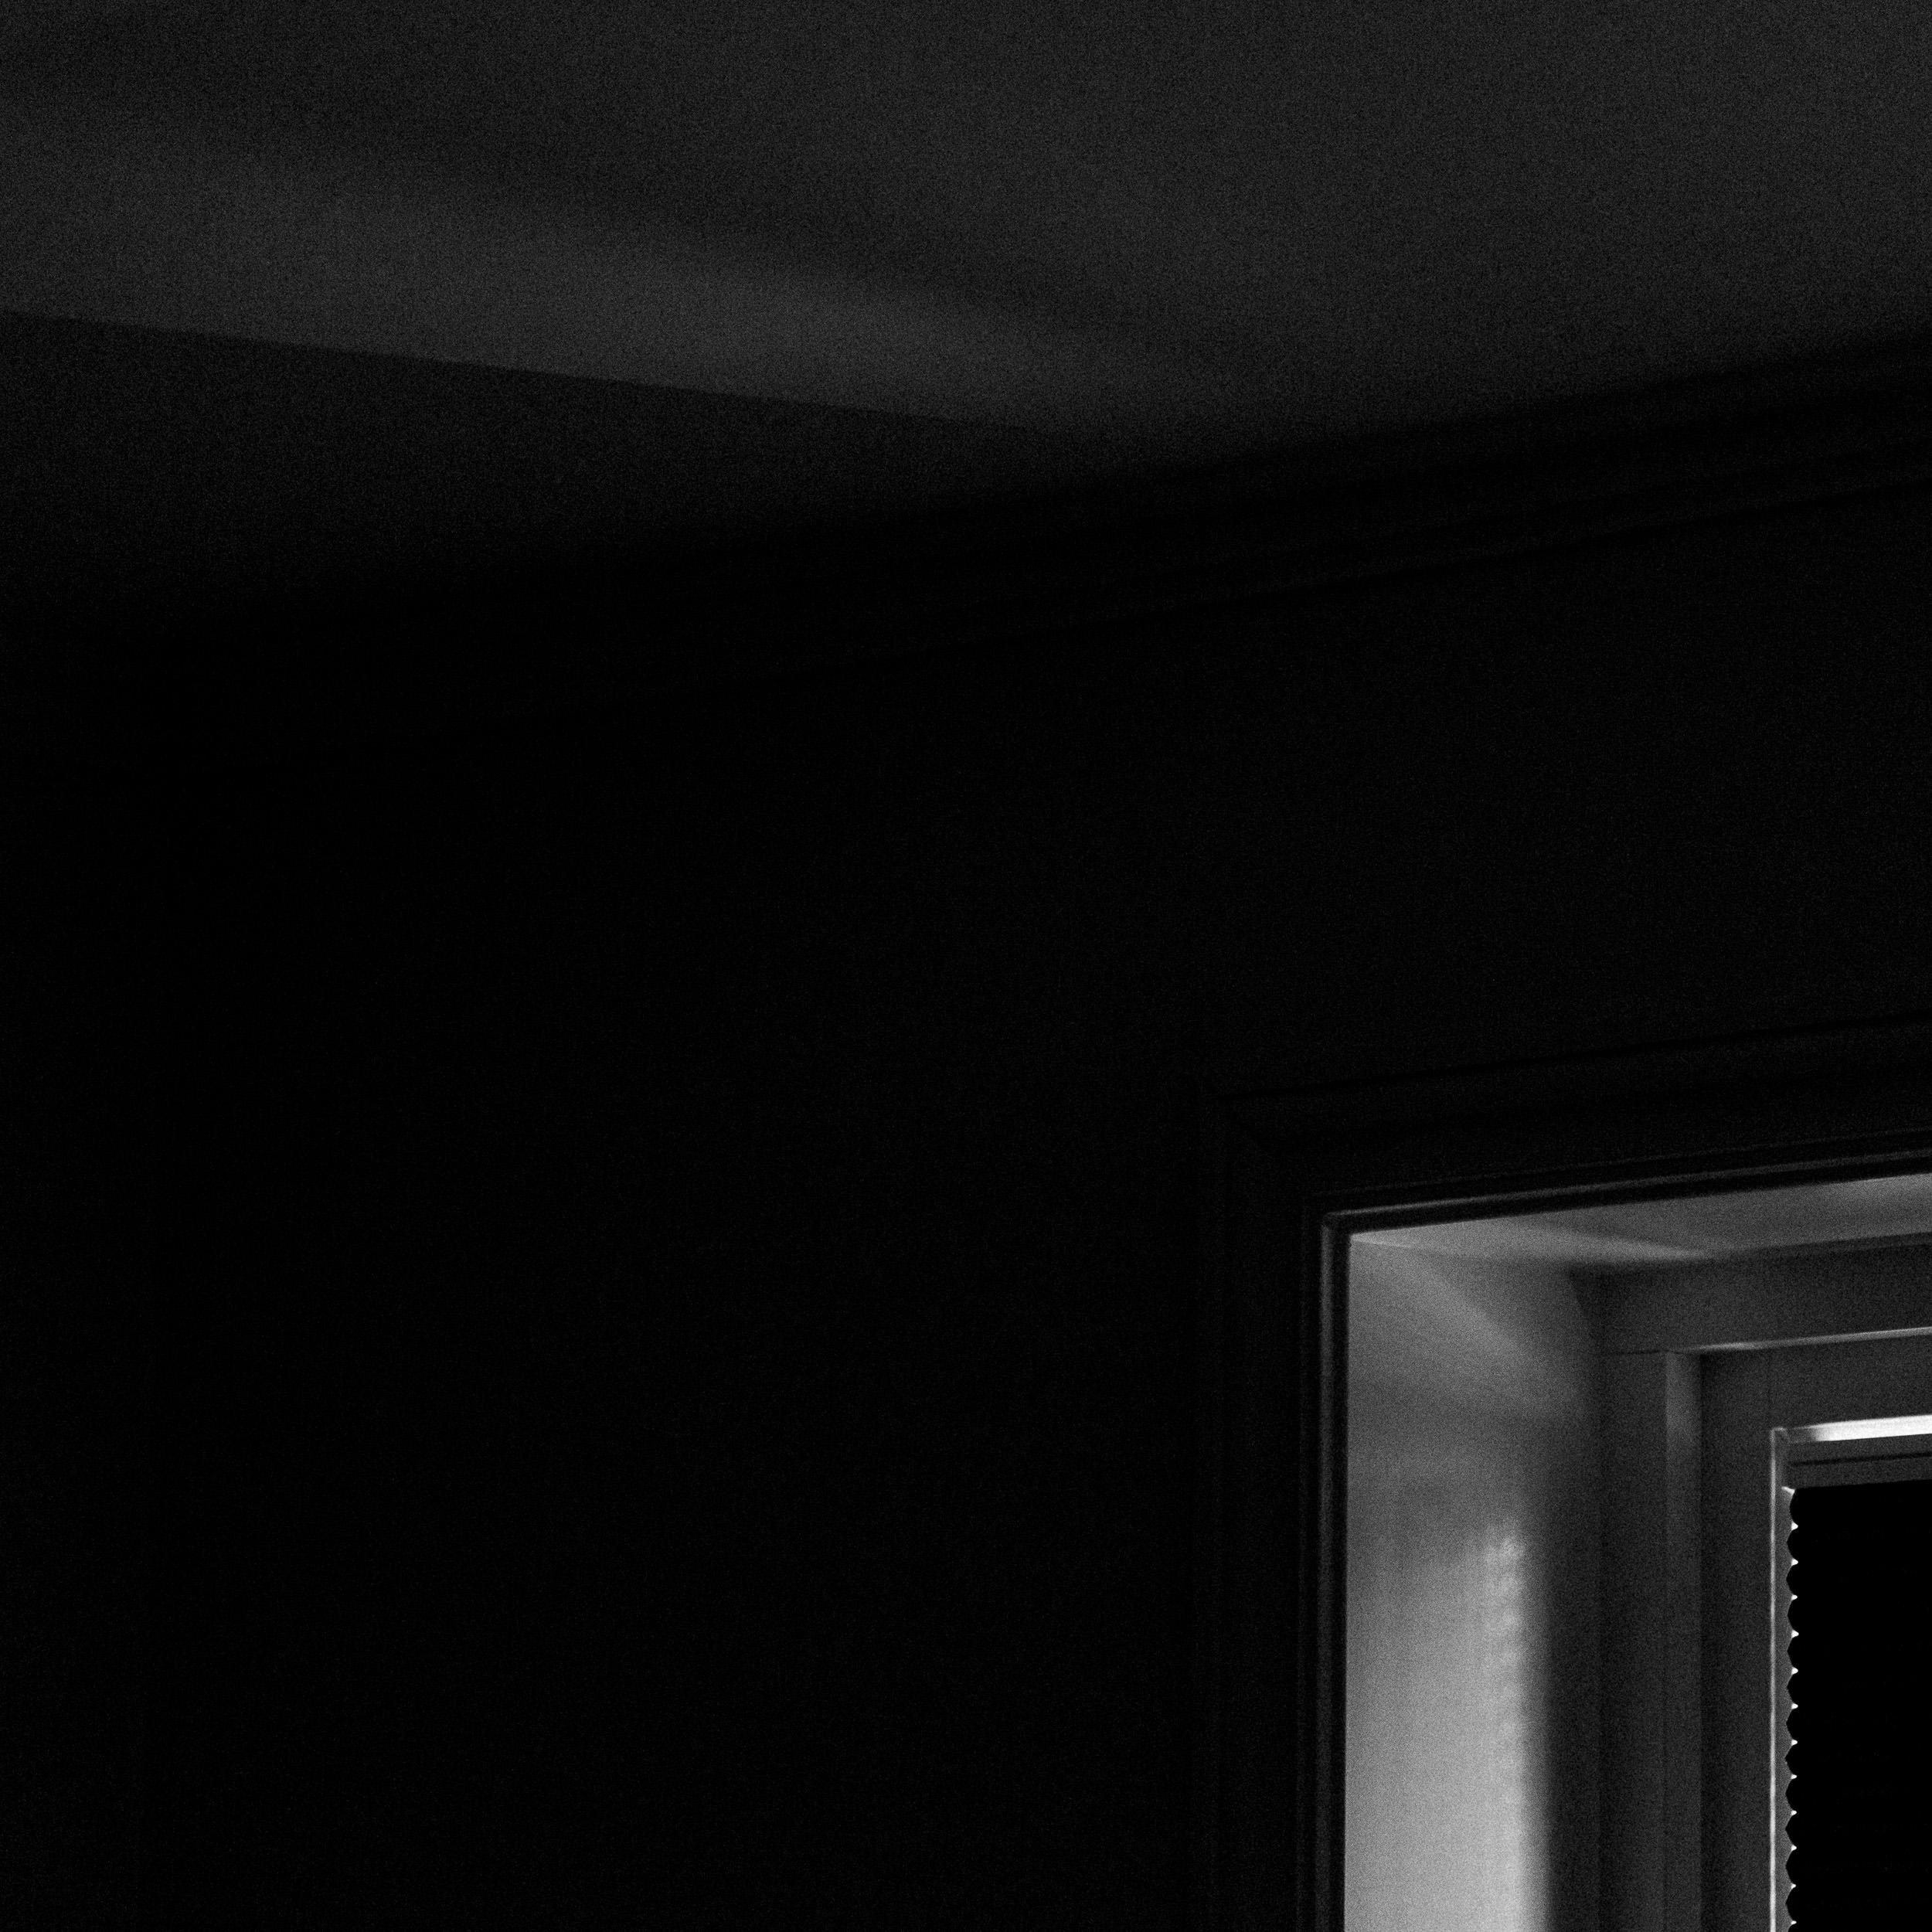 Frode_Olsen_Fine_art_photography_The_Rorschach_Exposures_07.jpg